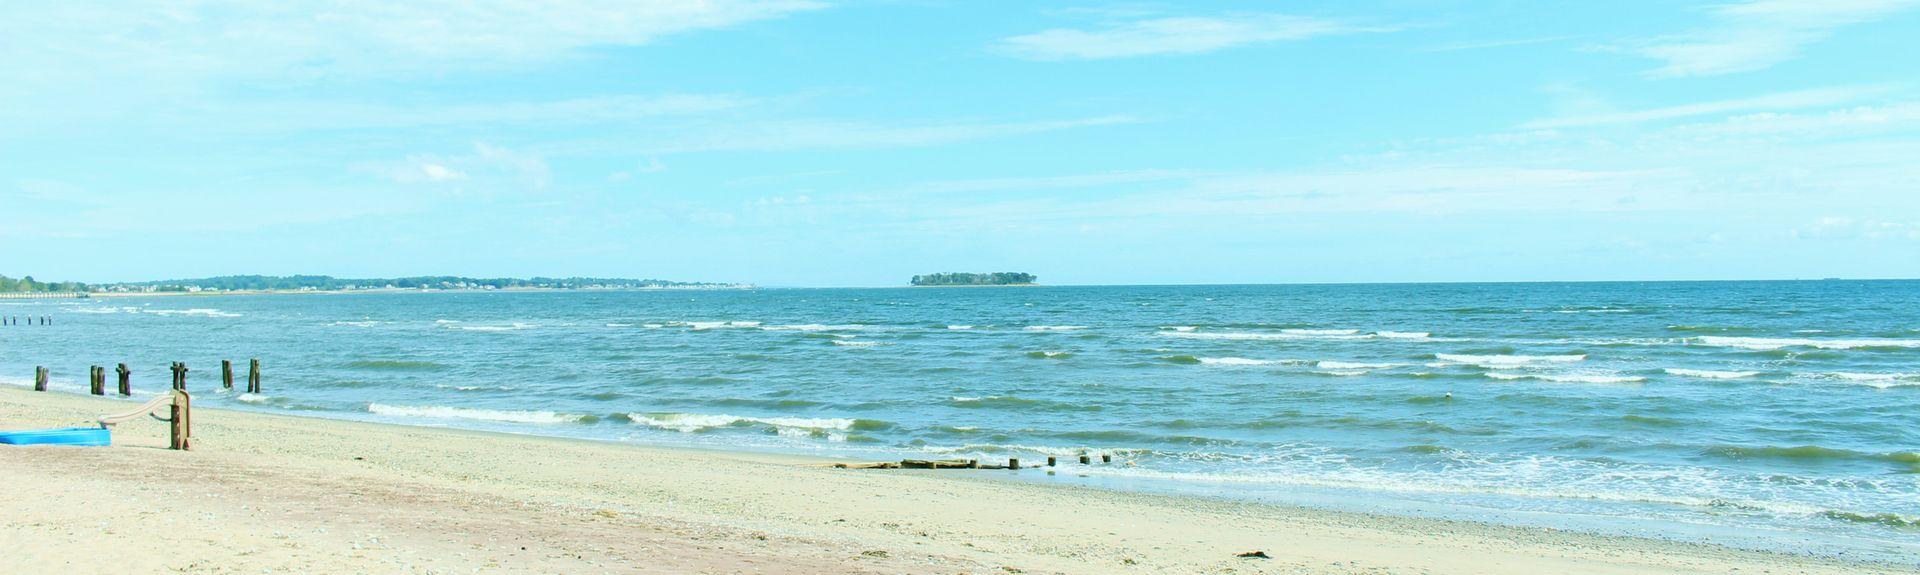 Devon / Walnut Beach, Milford, CT, USA